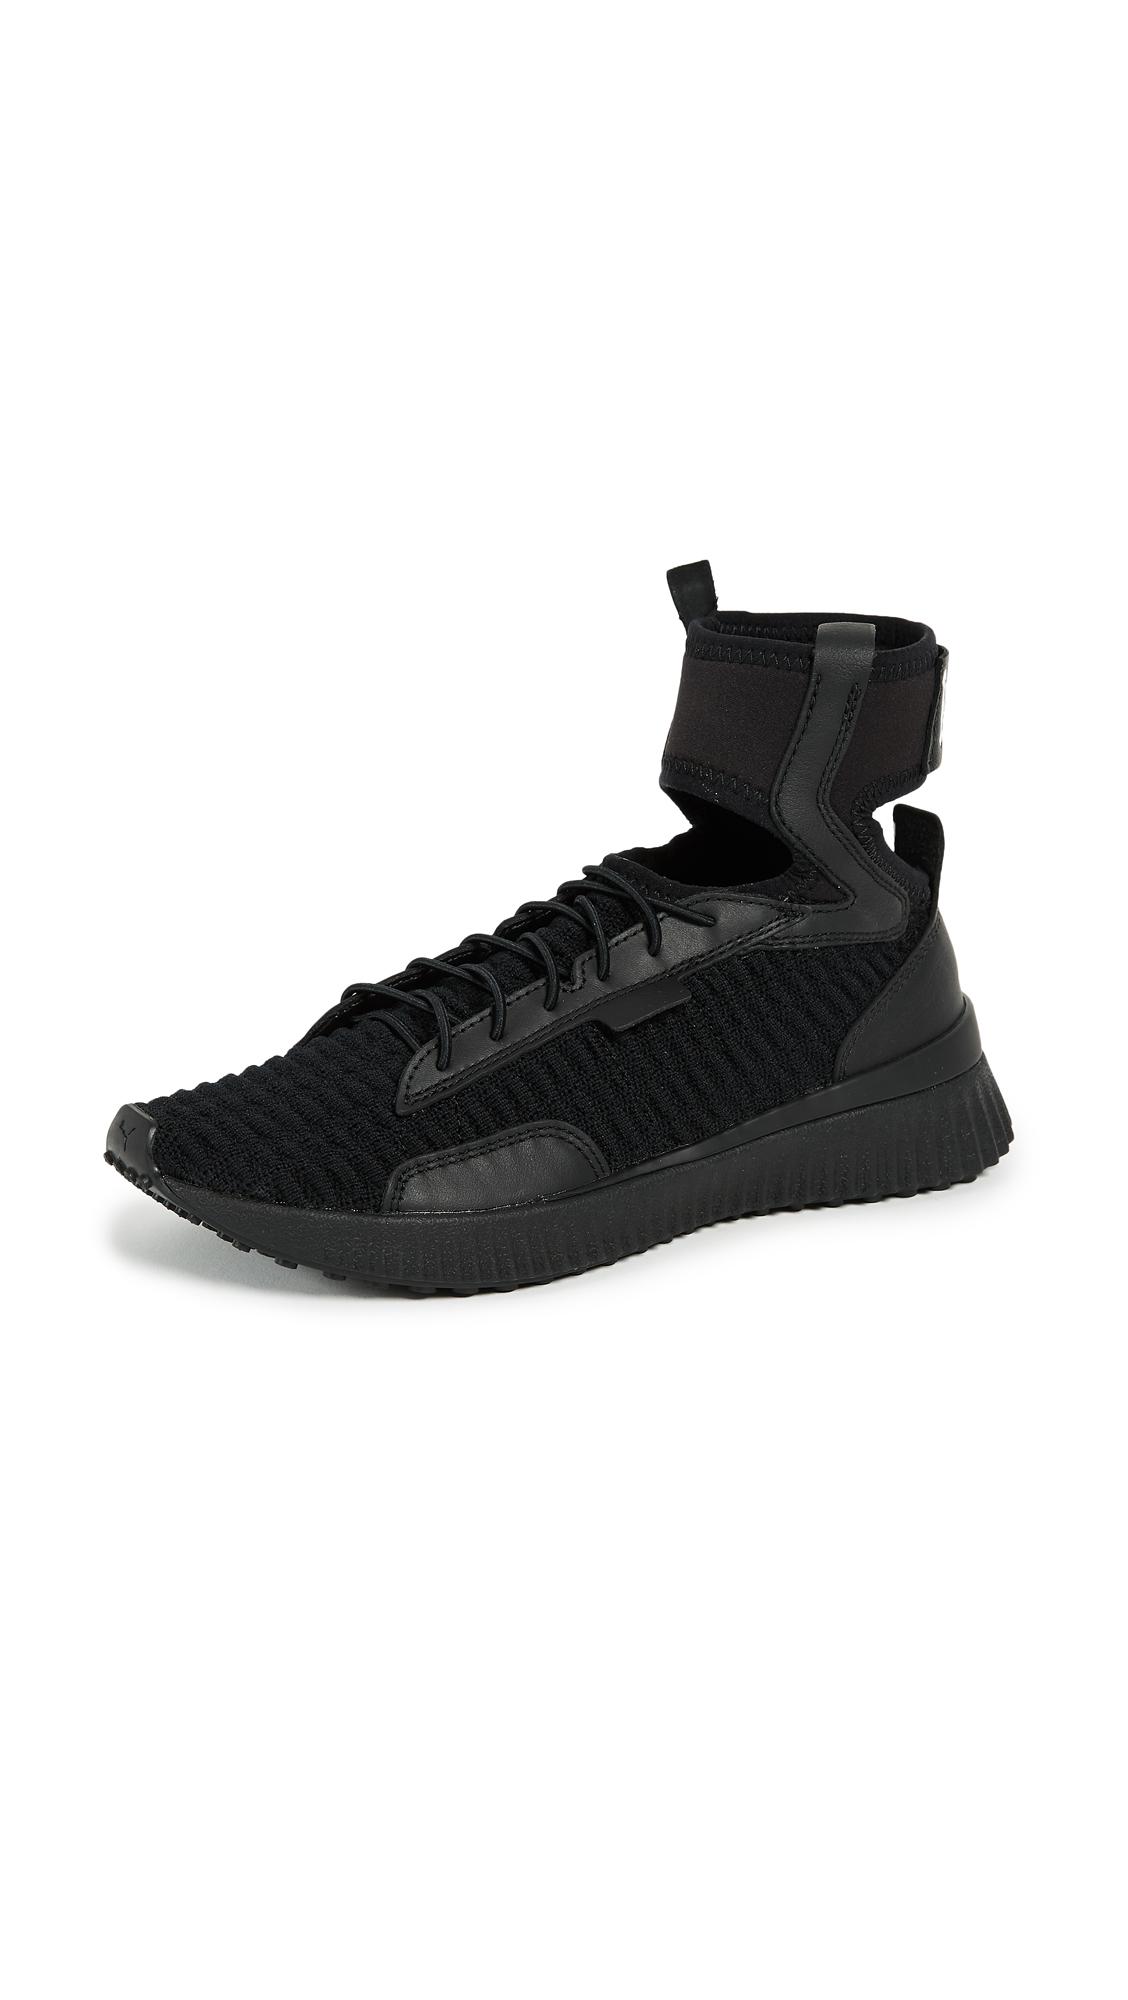 Photo of PUMA FENTY x PUMA Trainer Mid Sneakers - buy PUMA shoes